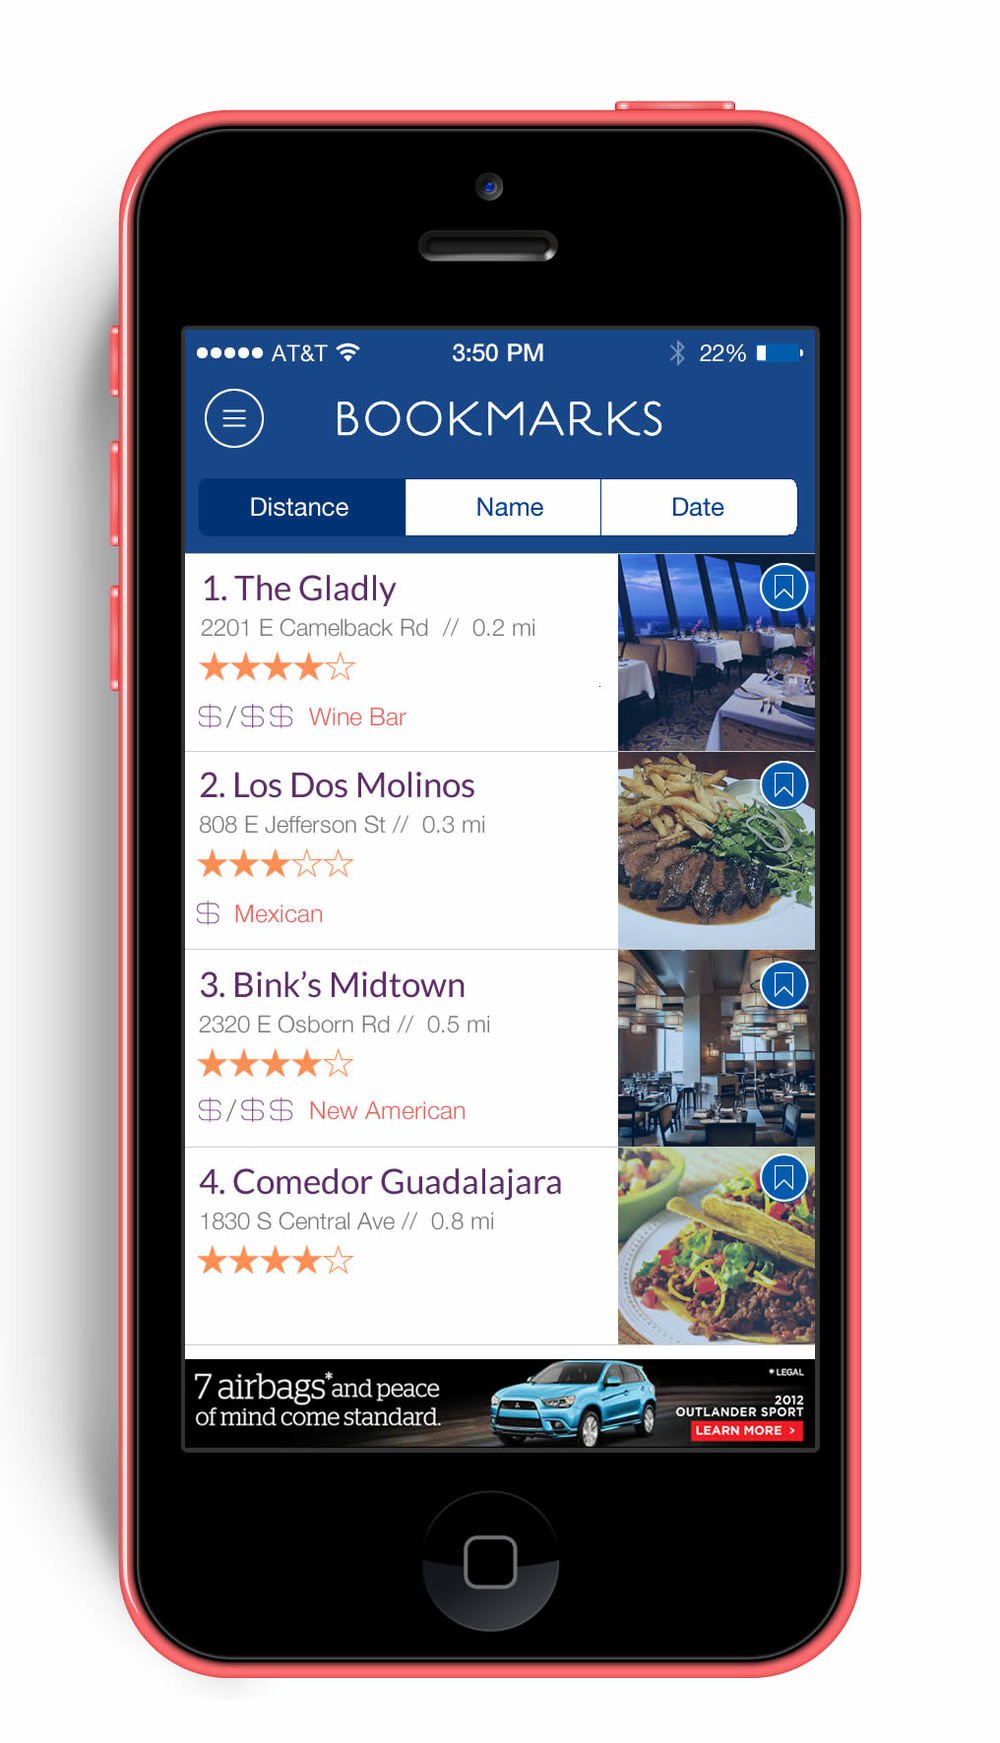 13BO-iOS7-Bookmarks.jpg